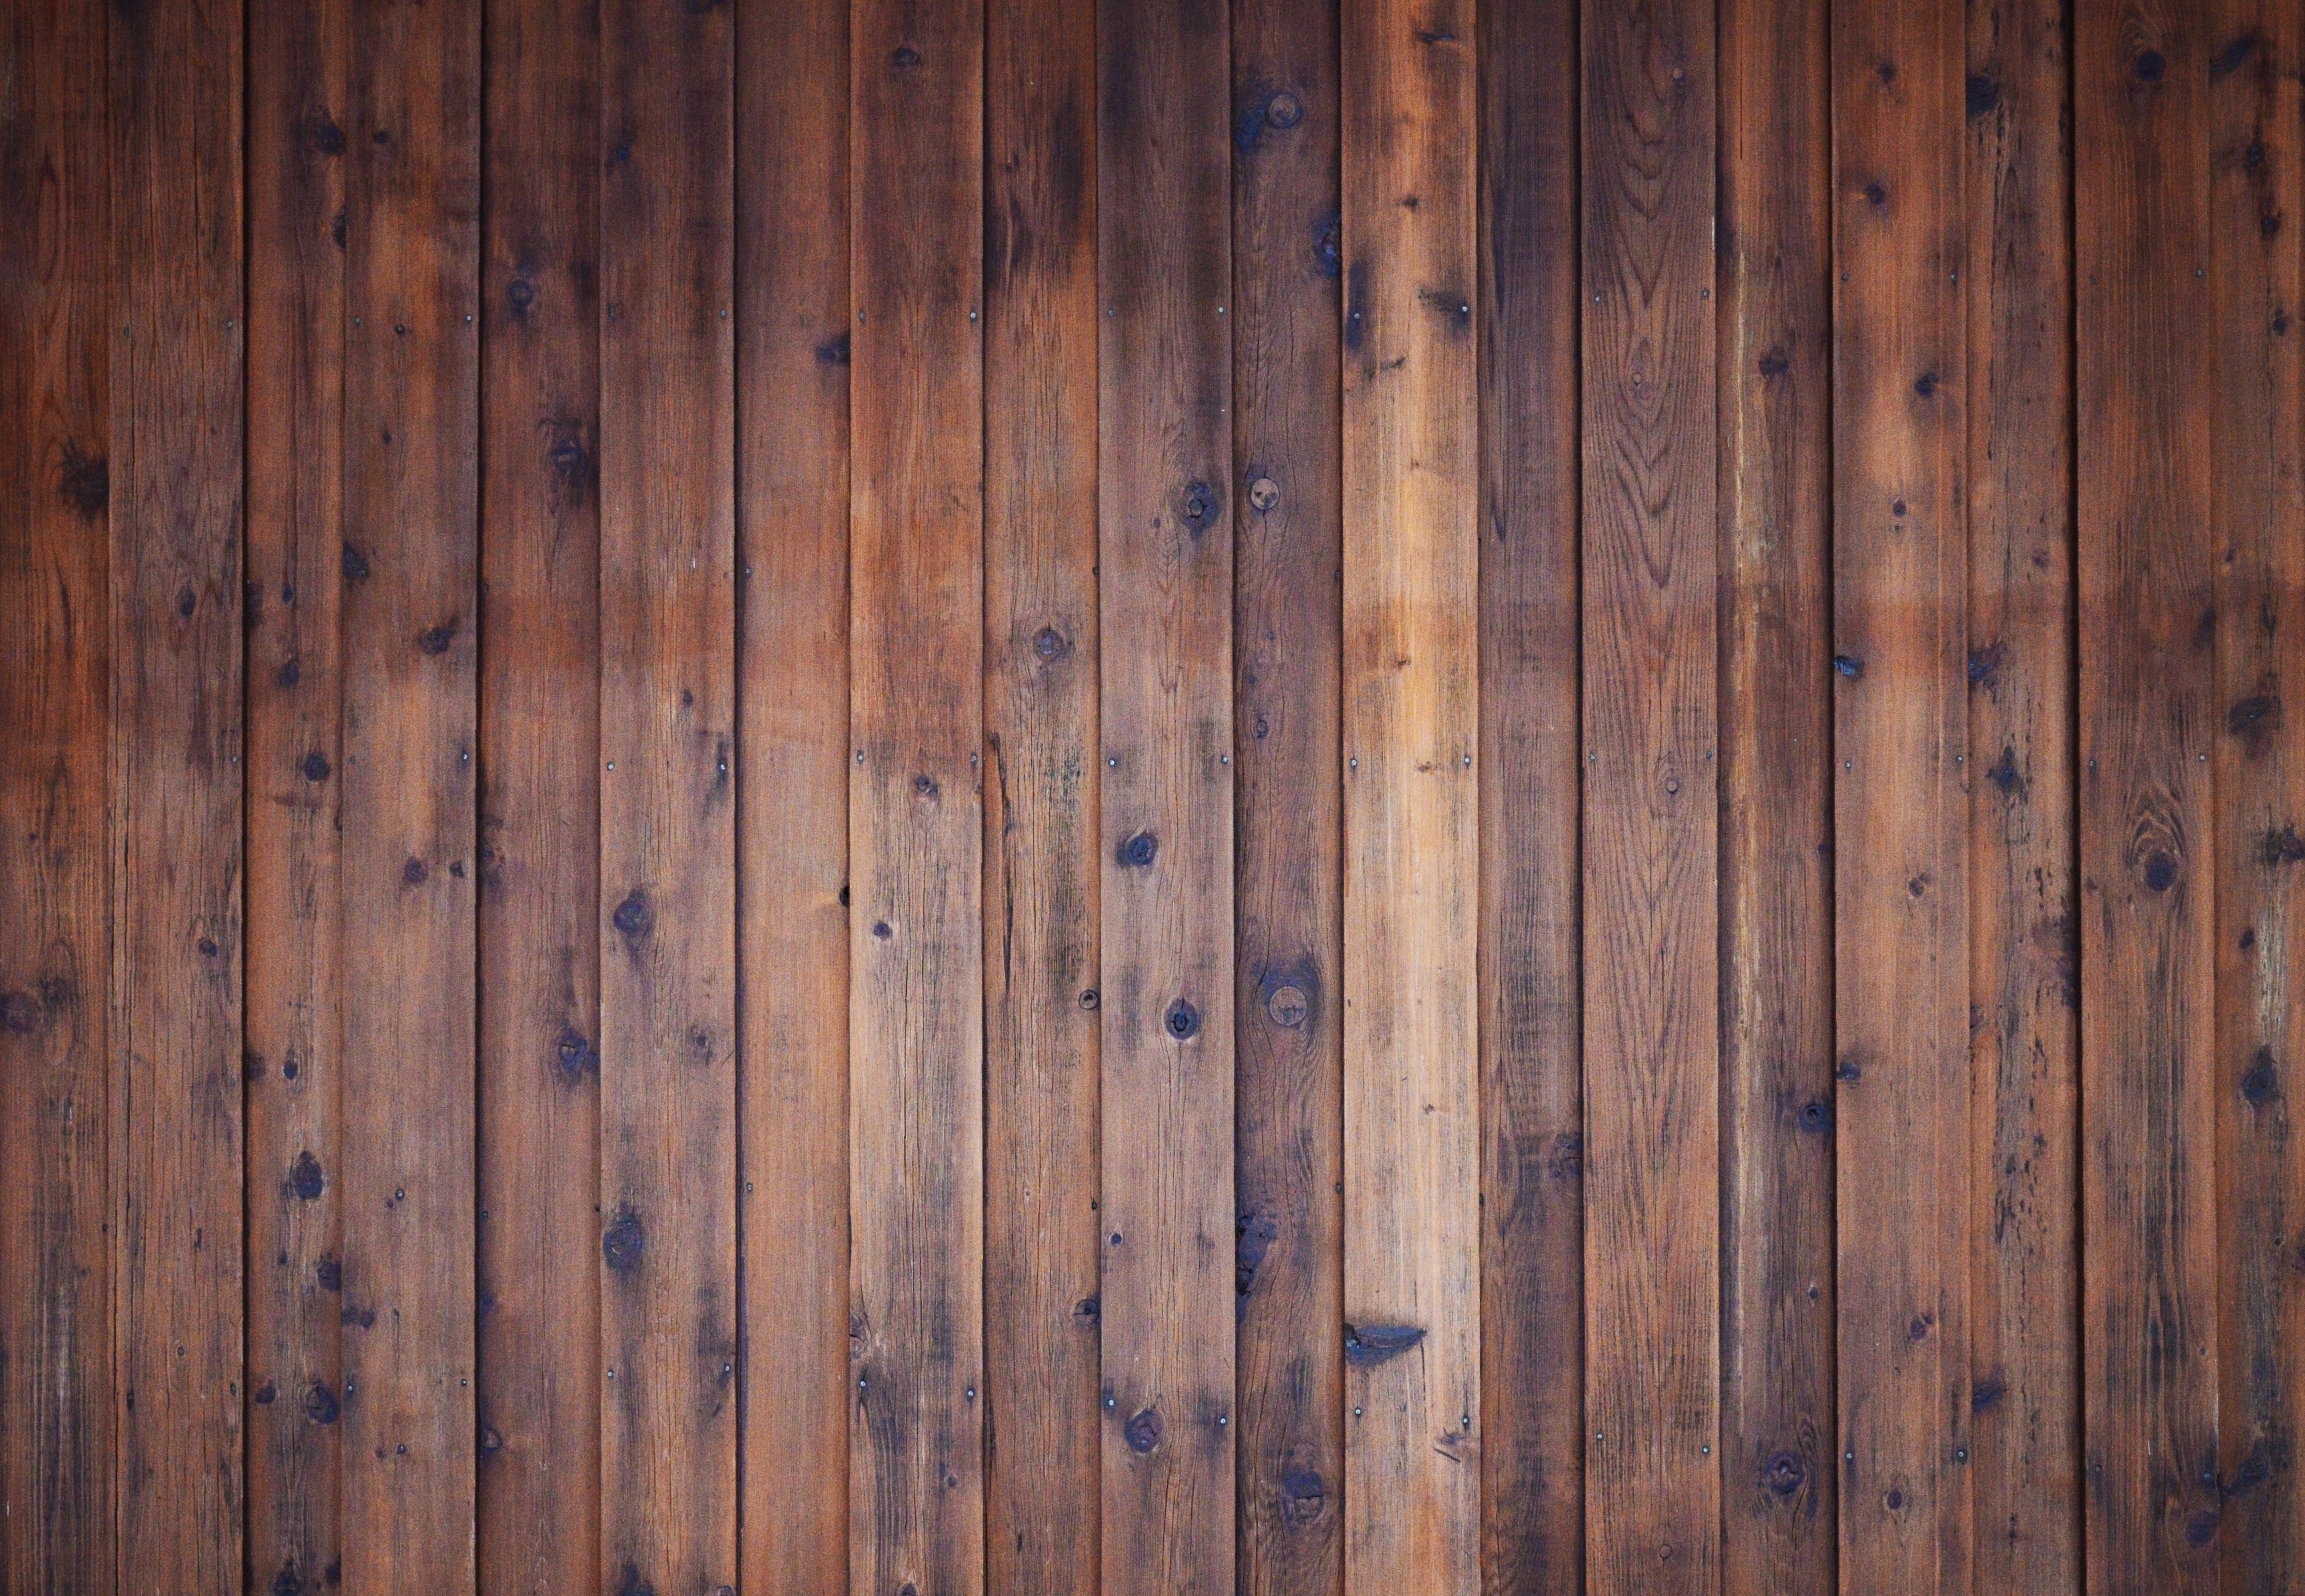 Erstaunlich Holz Textur Planke Stock Mauer Tür Hartholz Bodenbelag Holzboden  Laminatboden Holzbeize